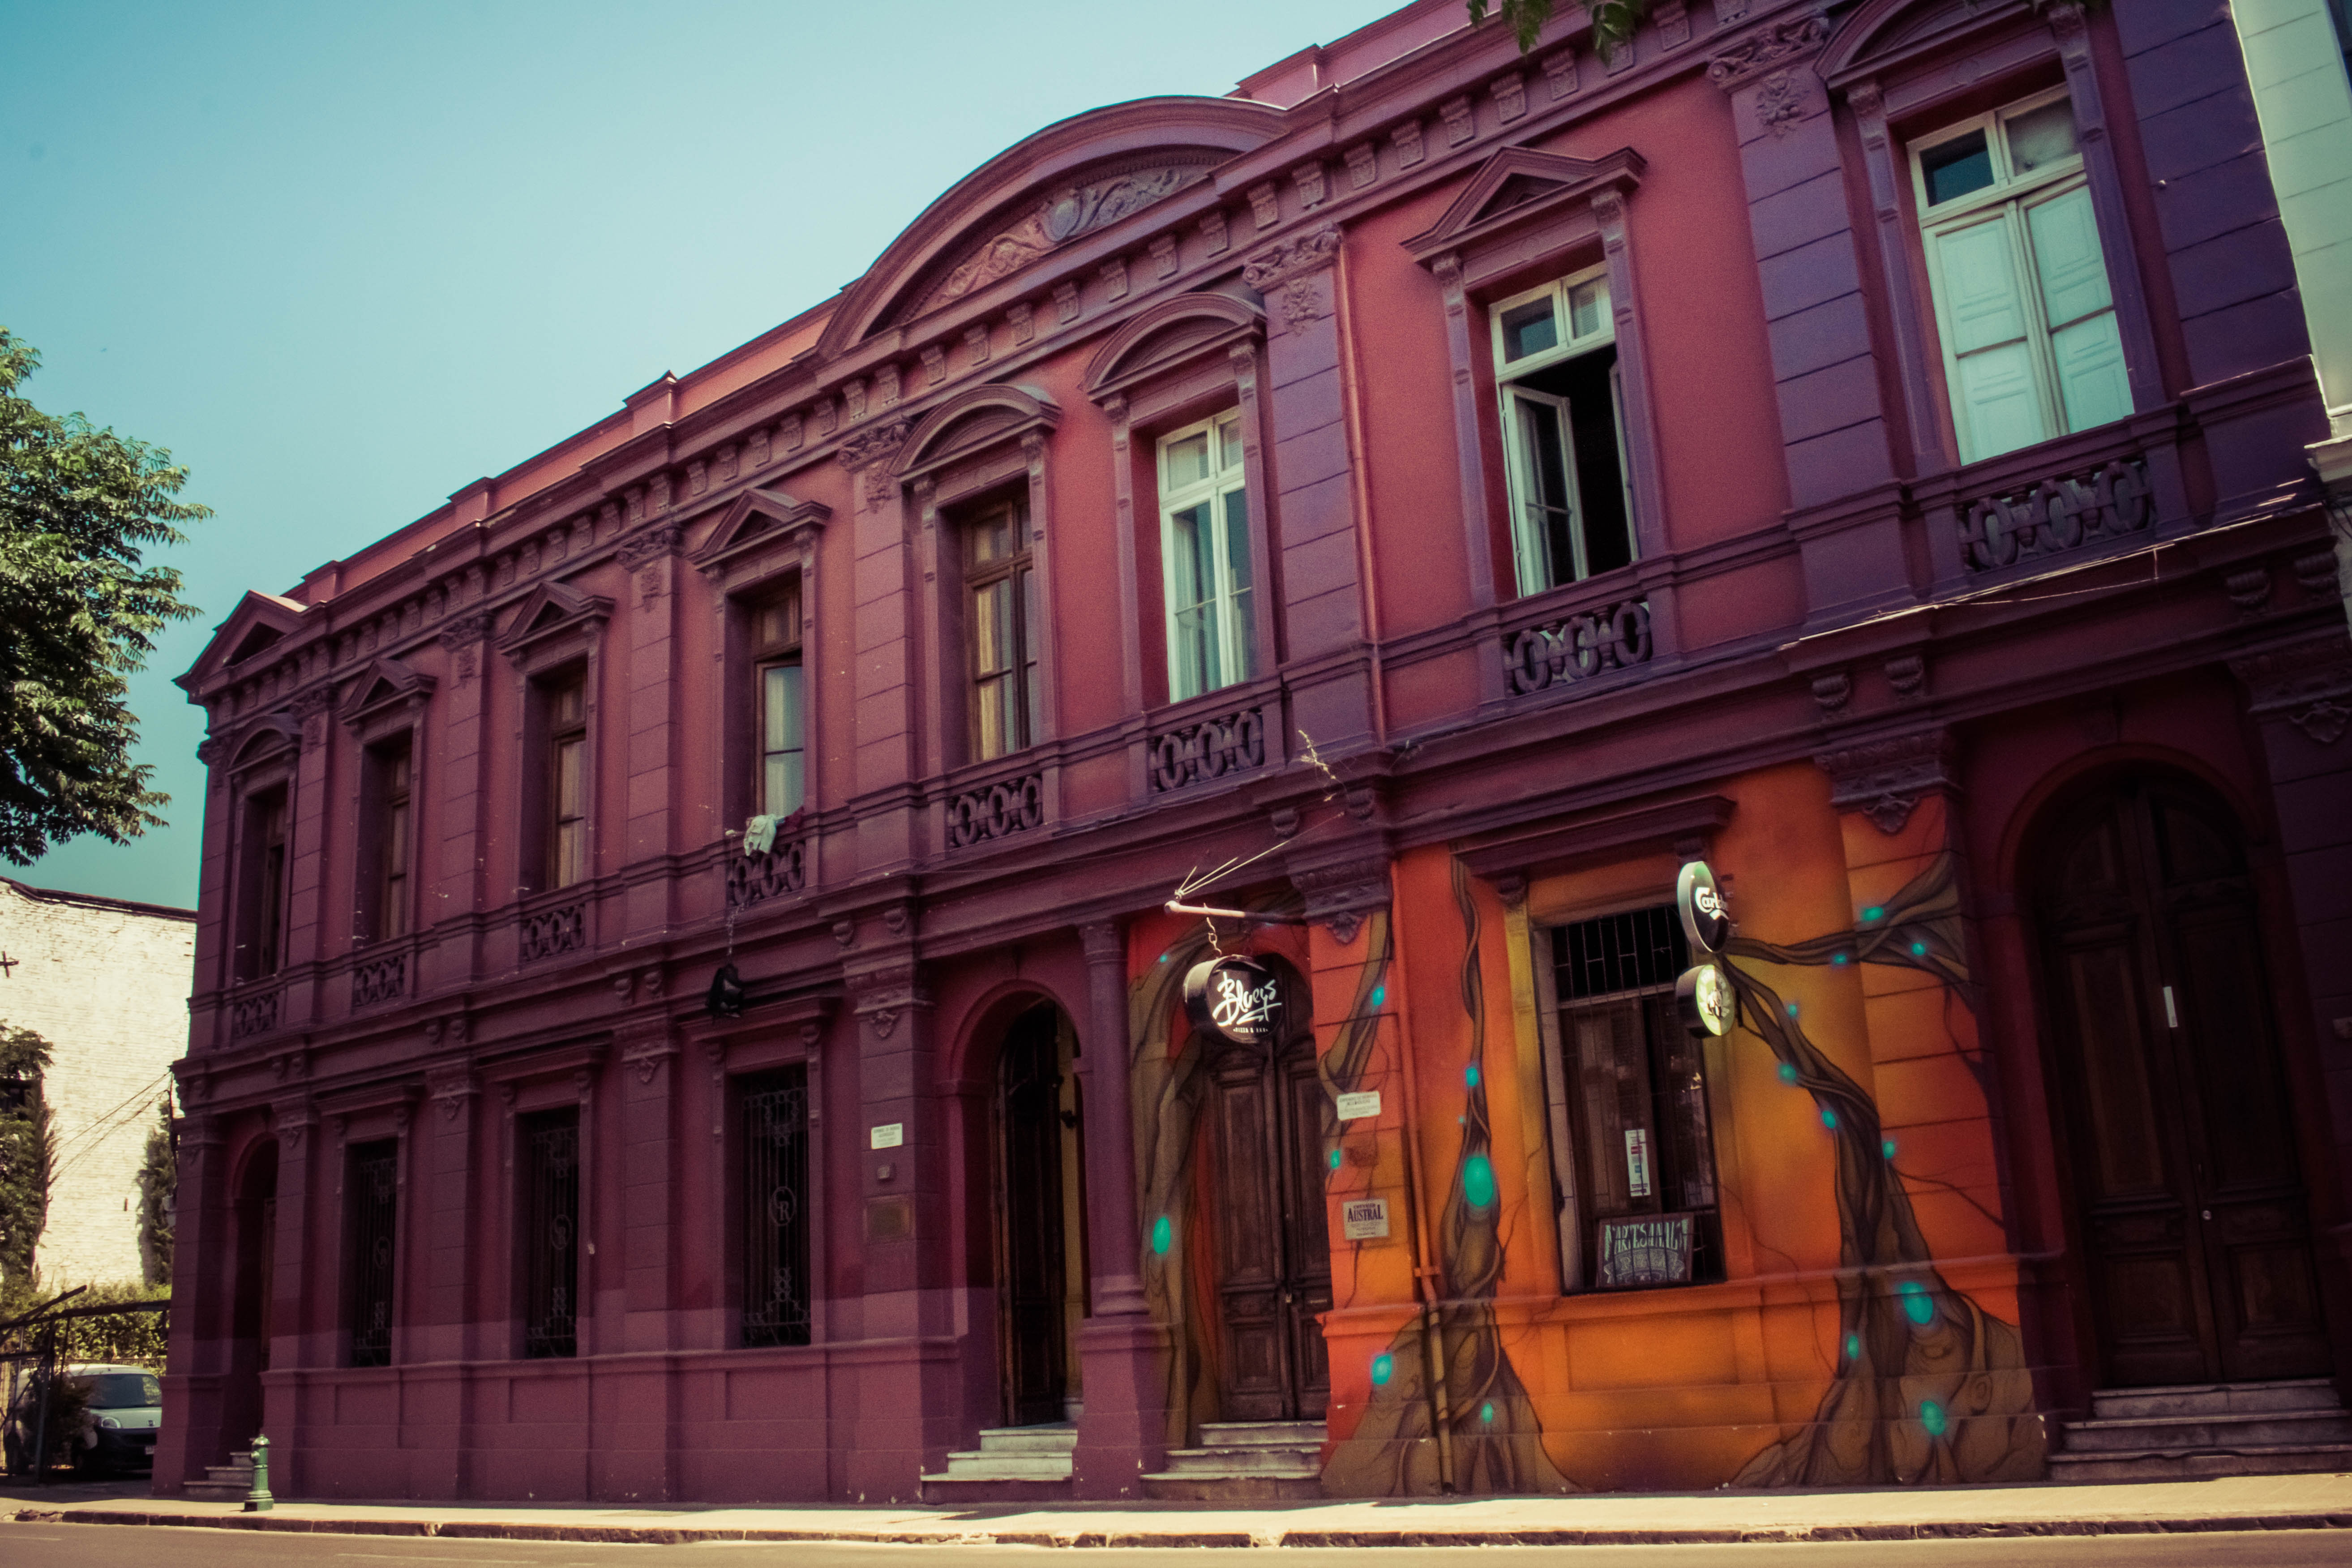 HOSTEL - La Casa Roja